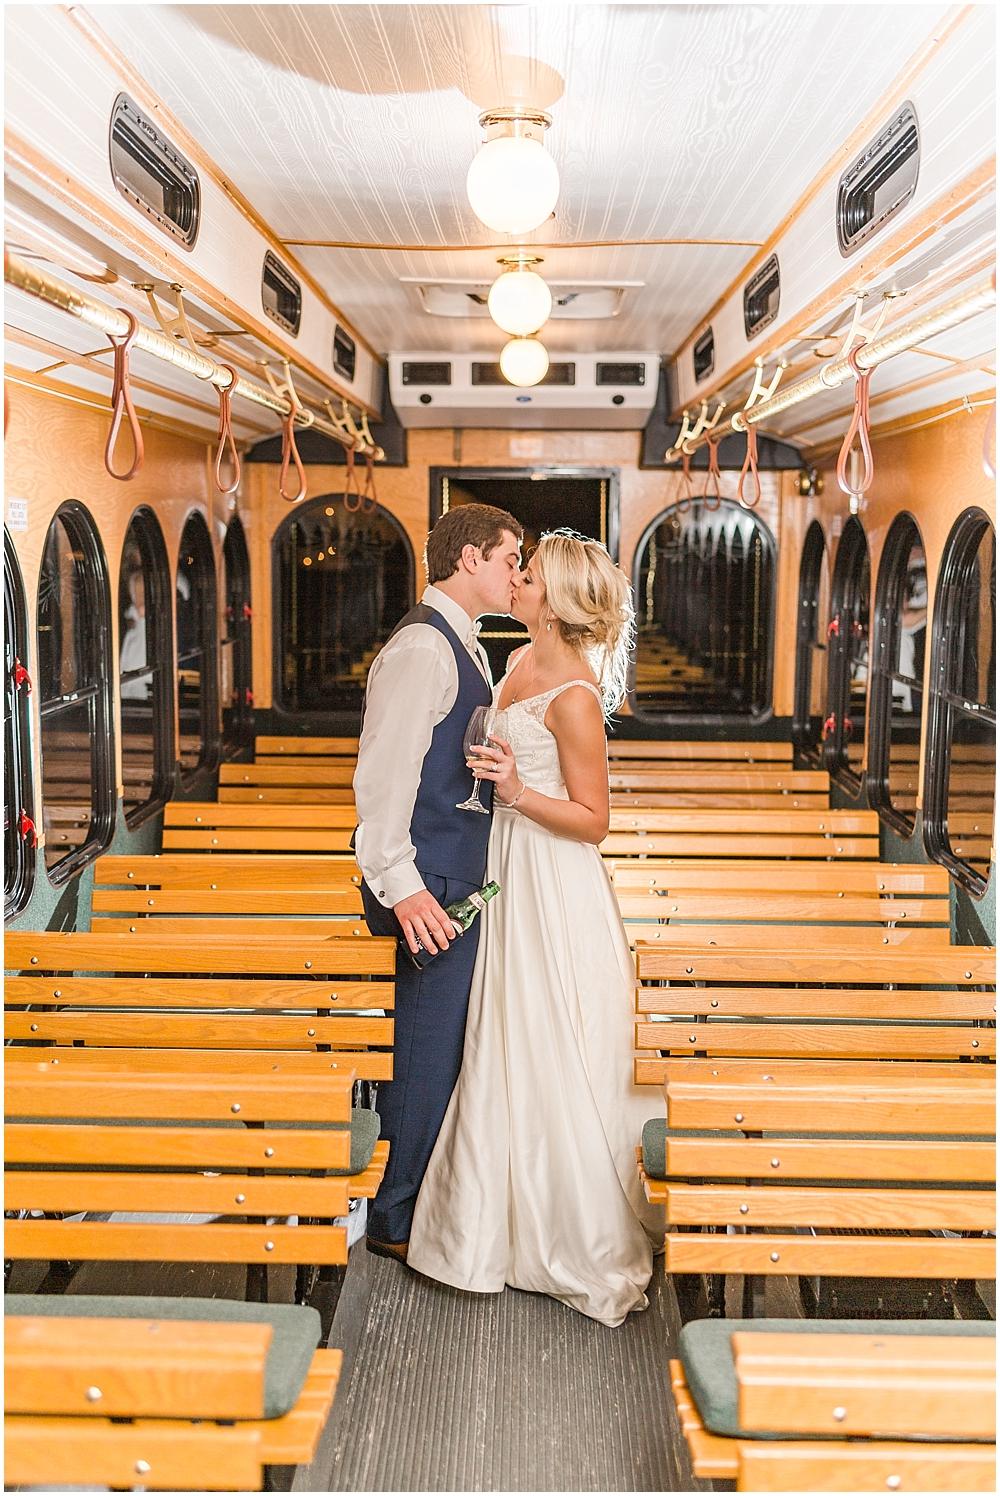 Ashton-Clark-Photography-Wedding-Portrait-Family-Photographer-Mobile-Alabama_0359.jpg